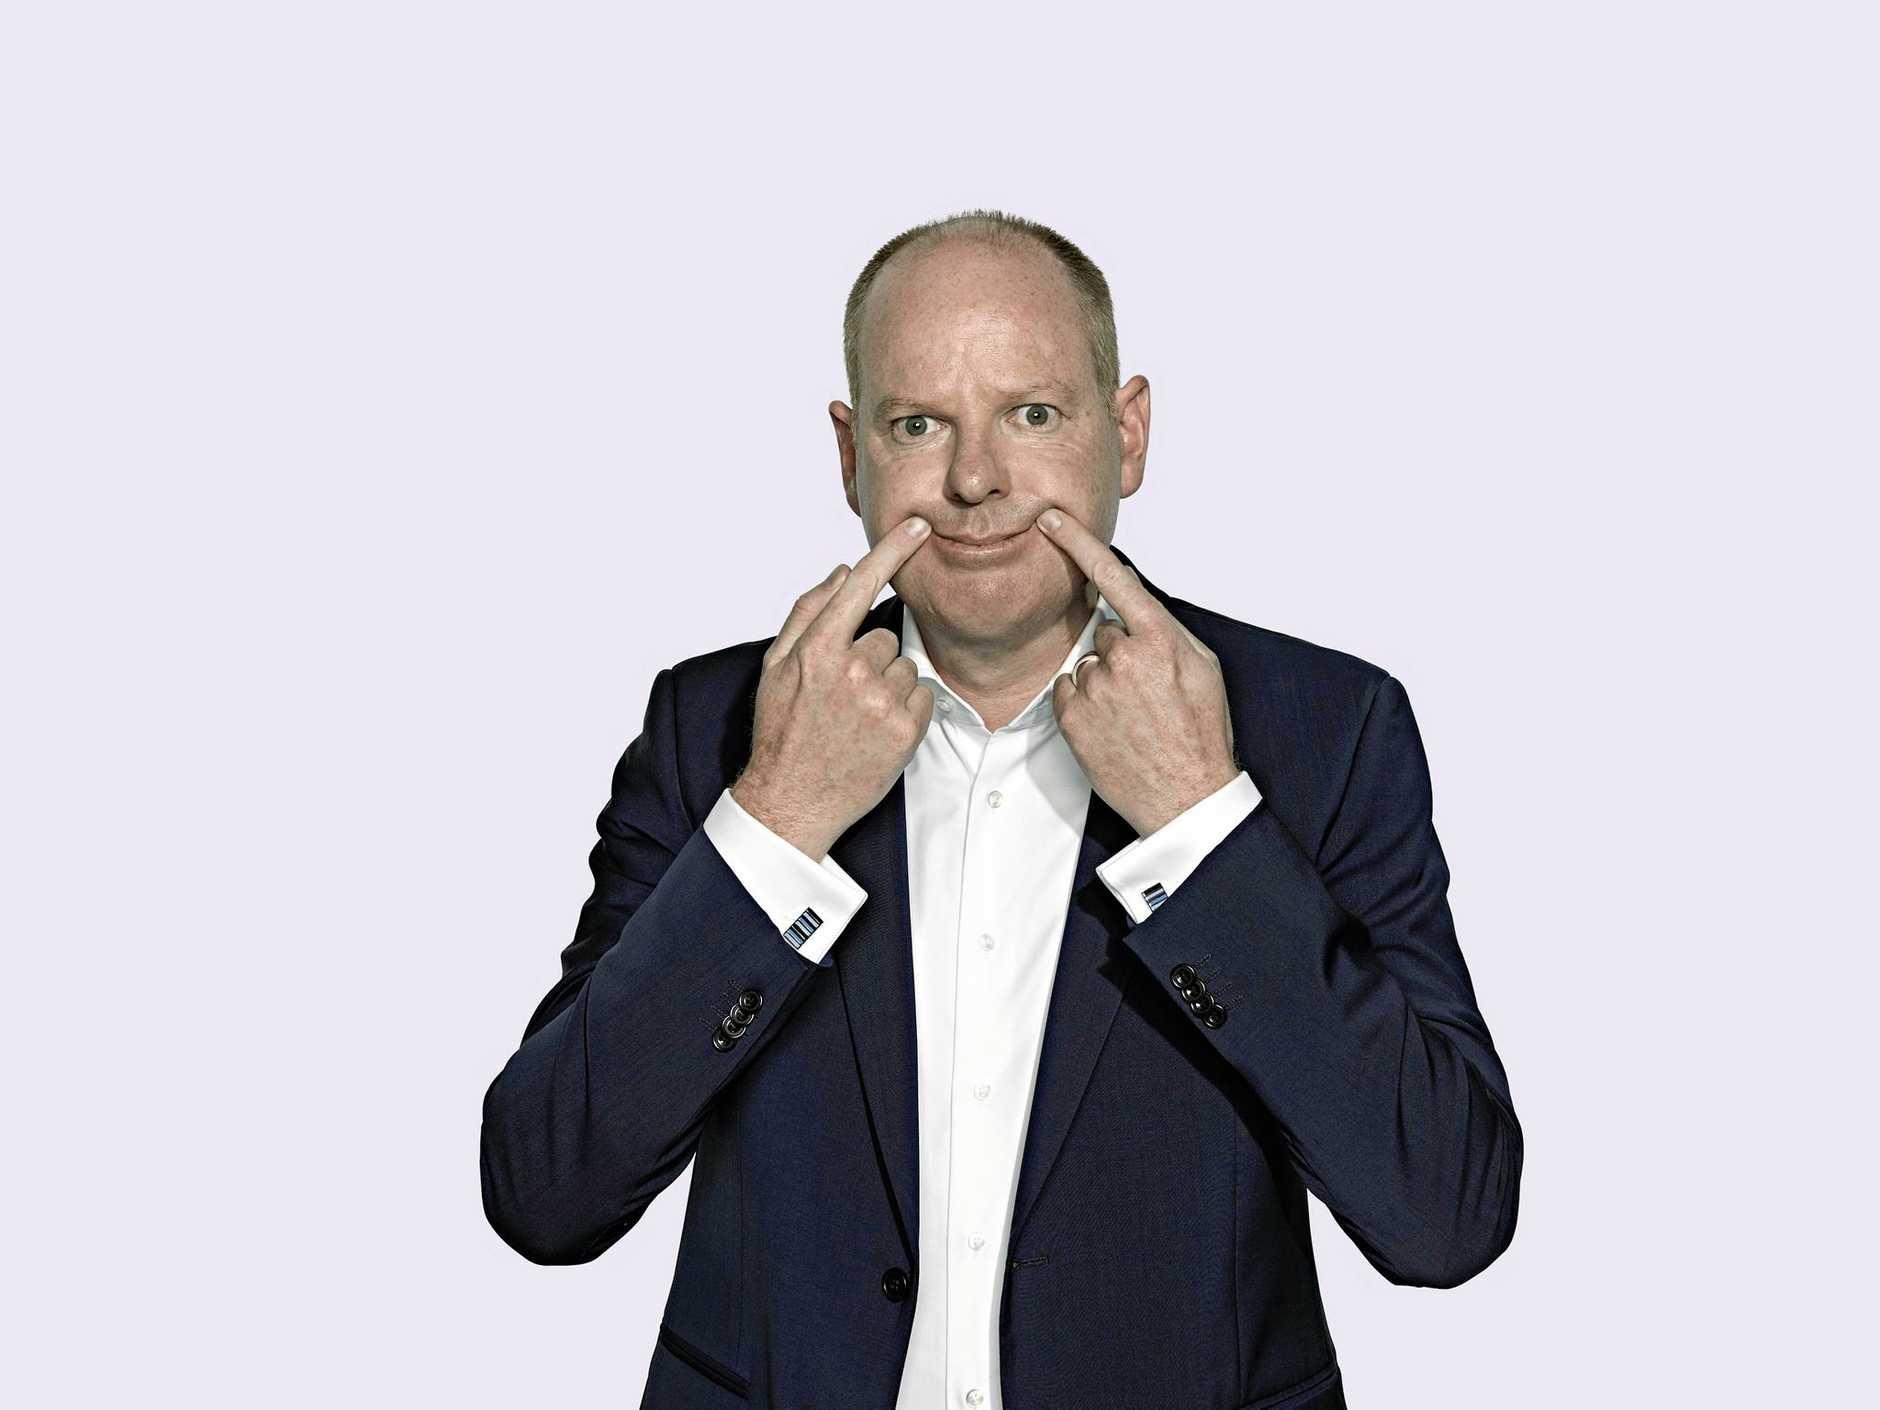 Australian comedian Tom Gleeson will host a political forum at Splendour.